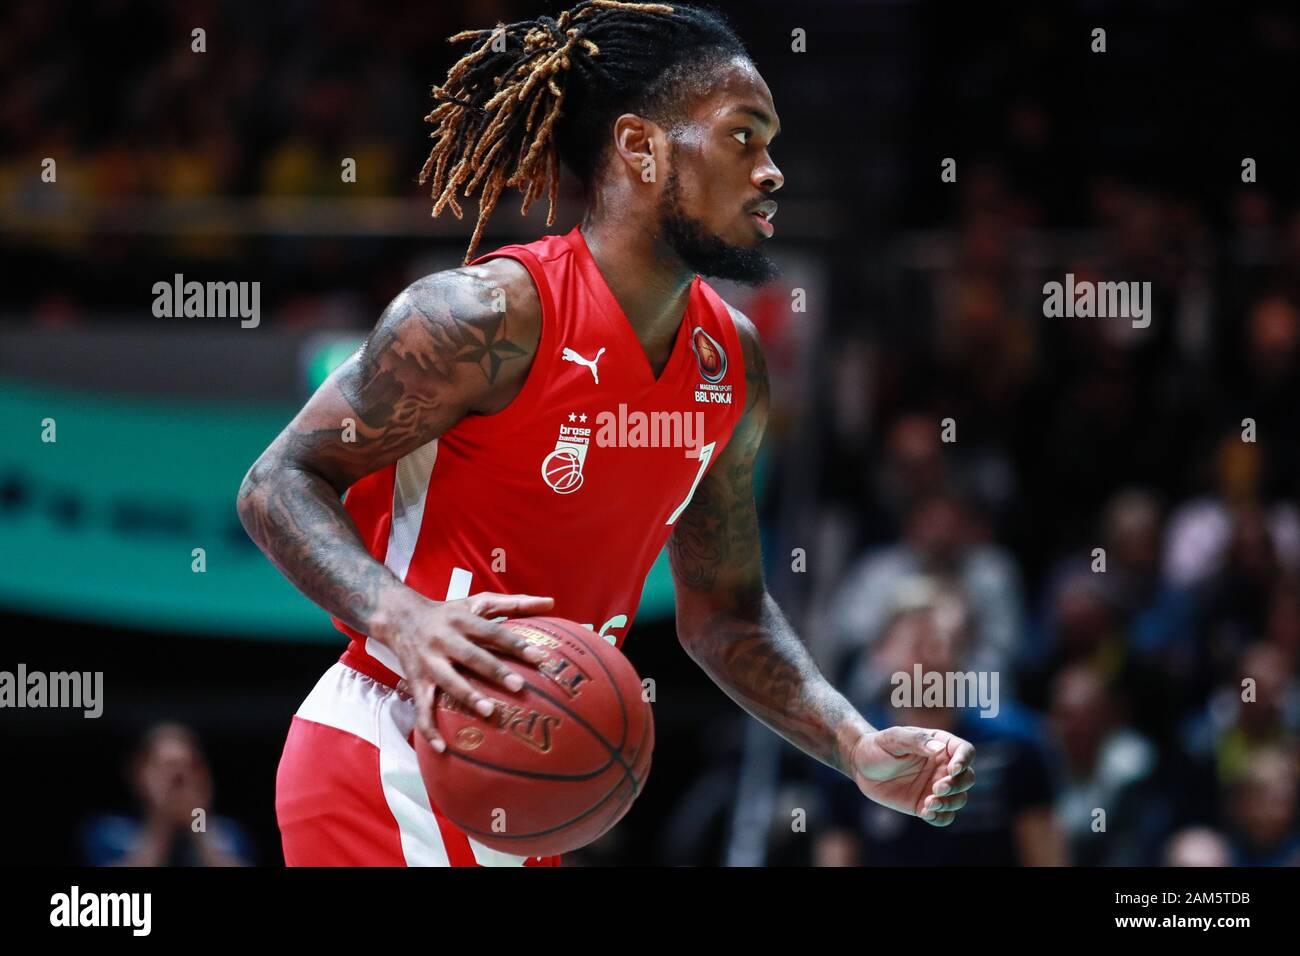 https://www.basketball-bund.de/wp-content/uploads/DBB-Journal-44-Web.pdf